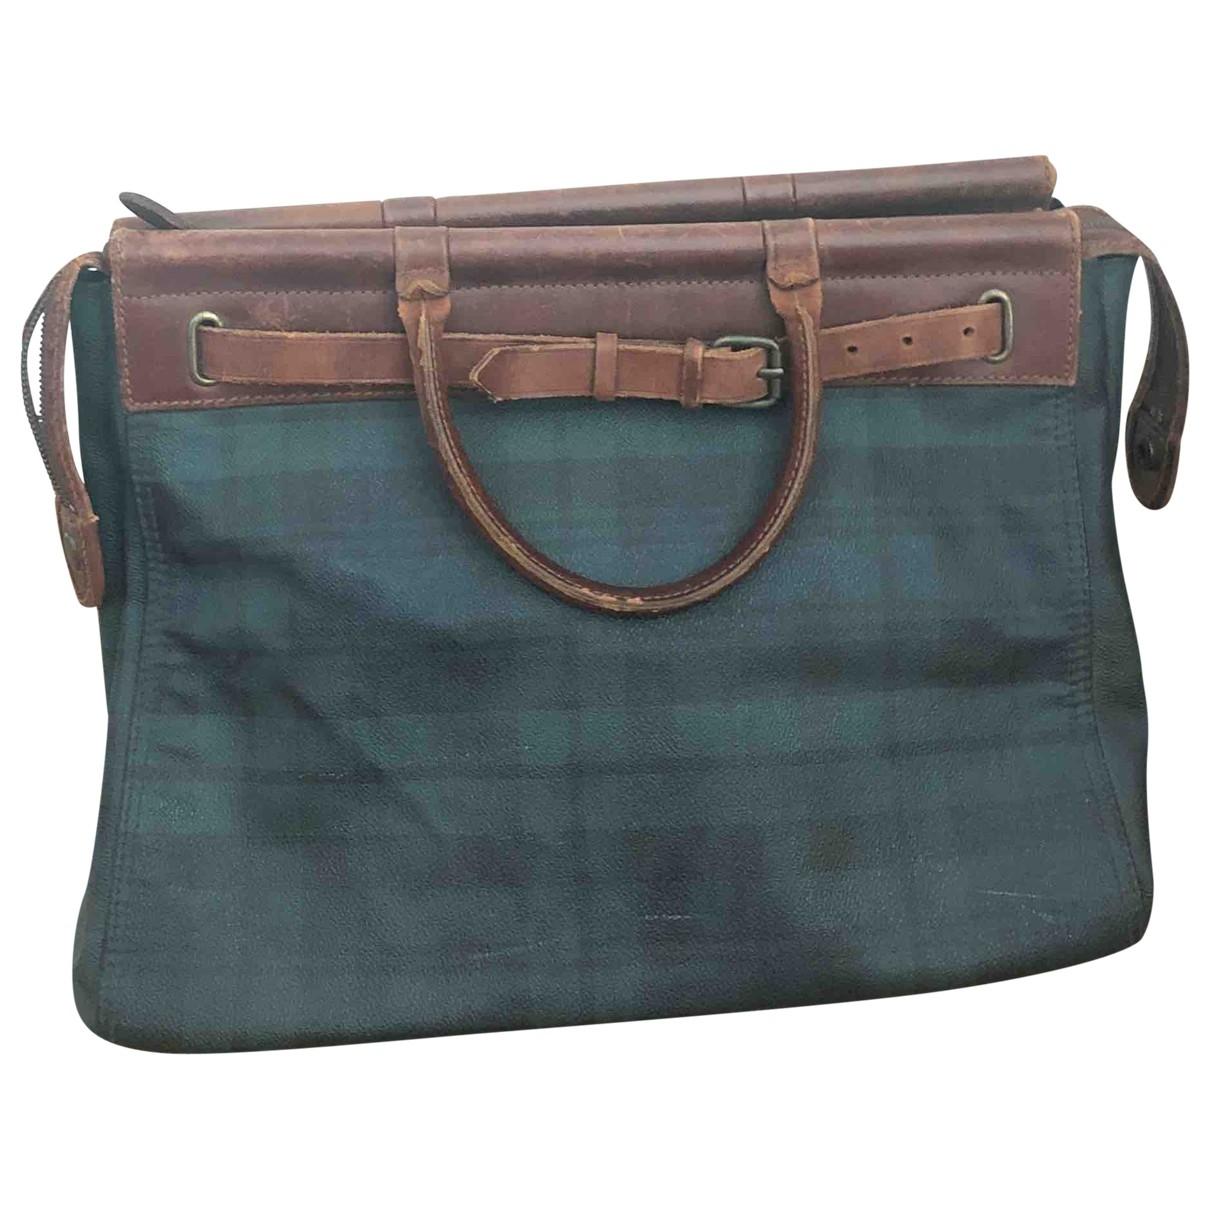 Polo Ralph Lauren \N Green Cloth handbag for Women \N